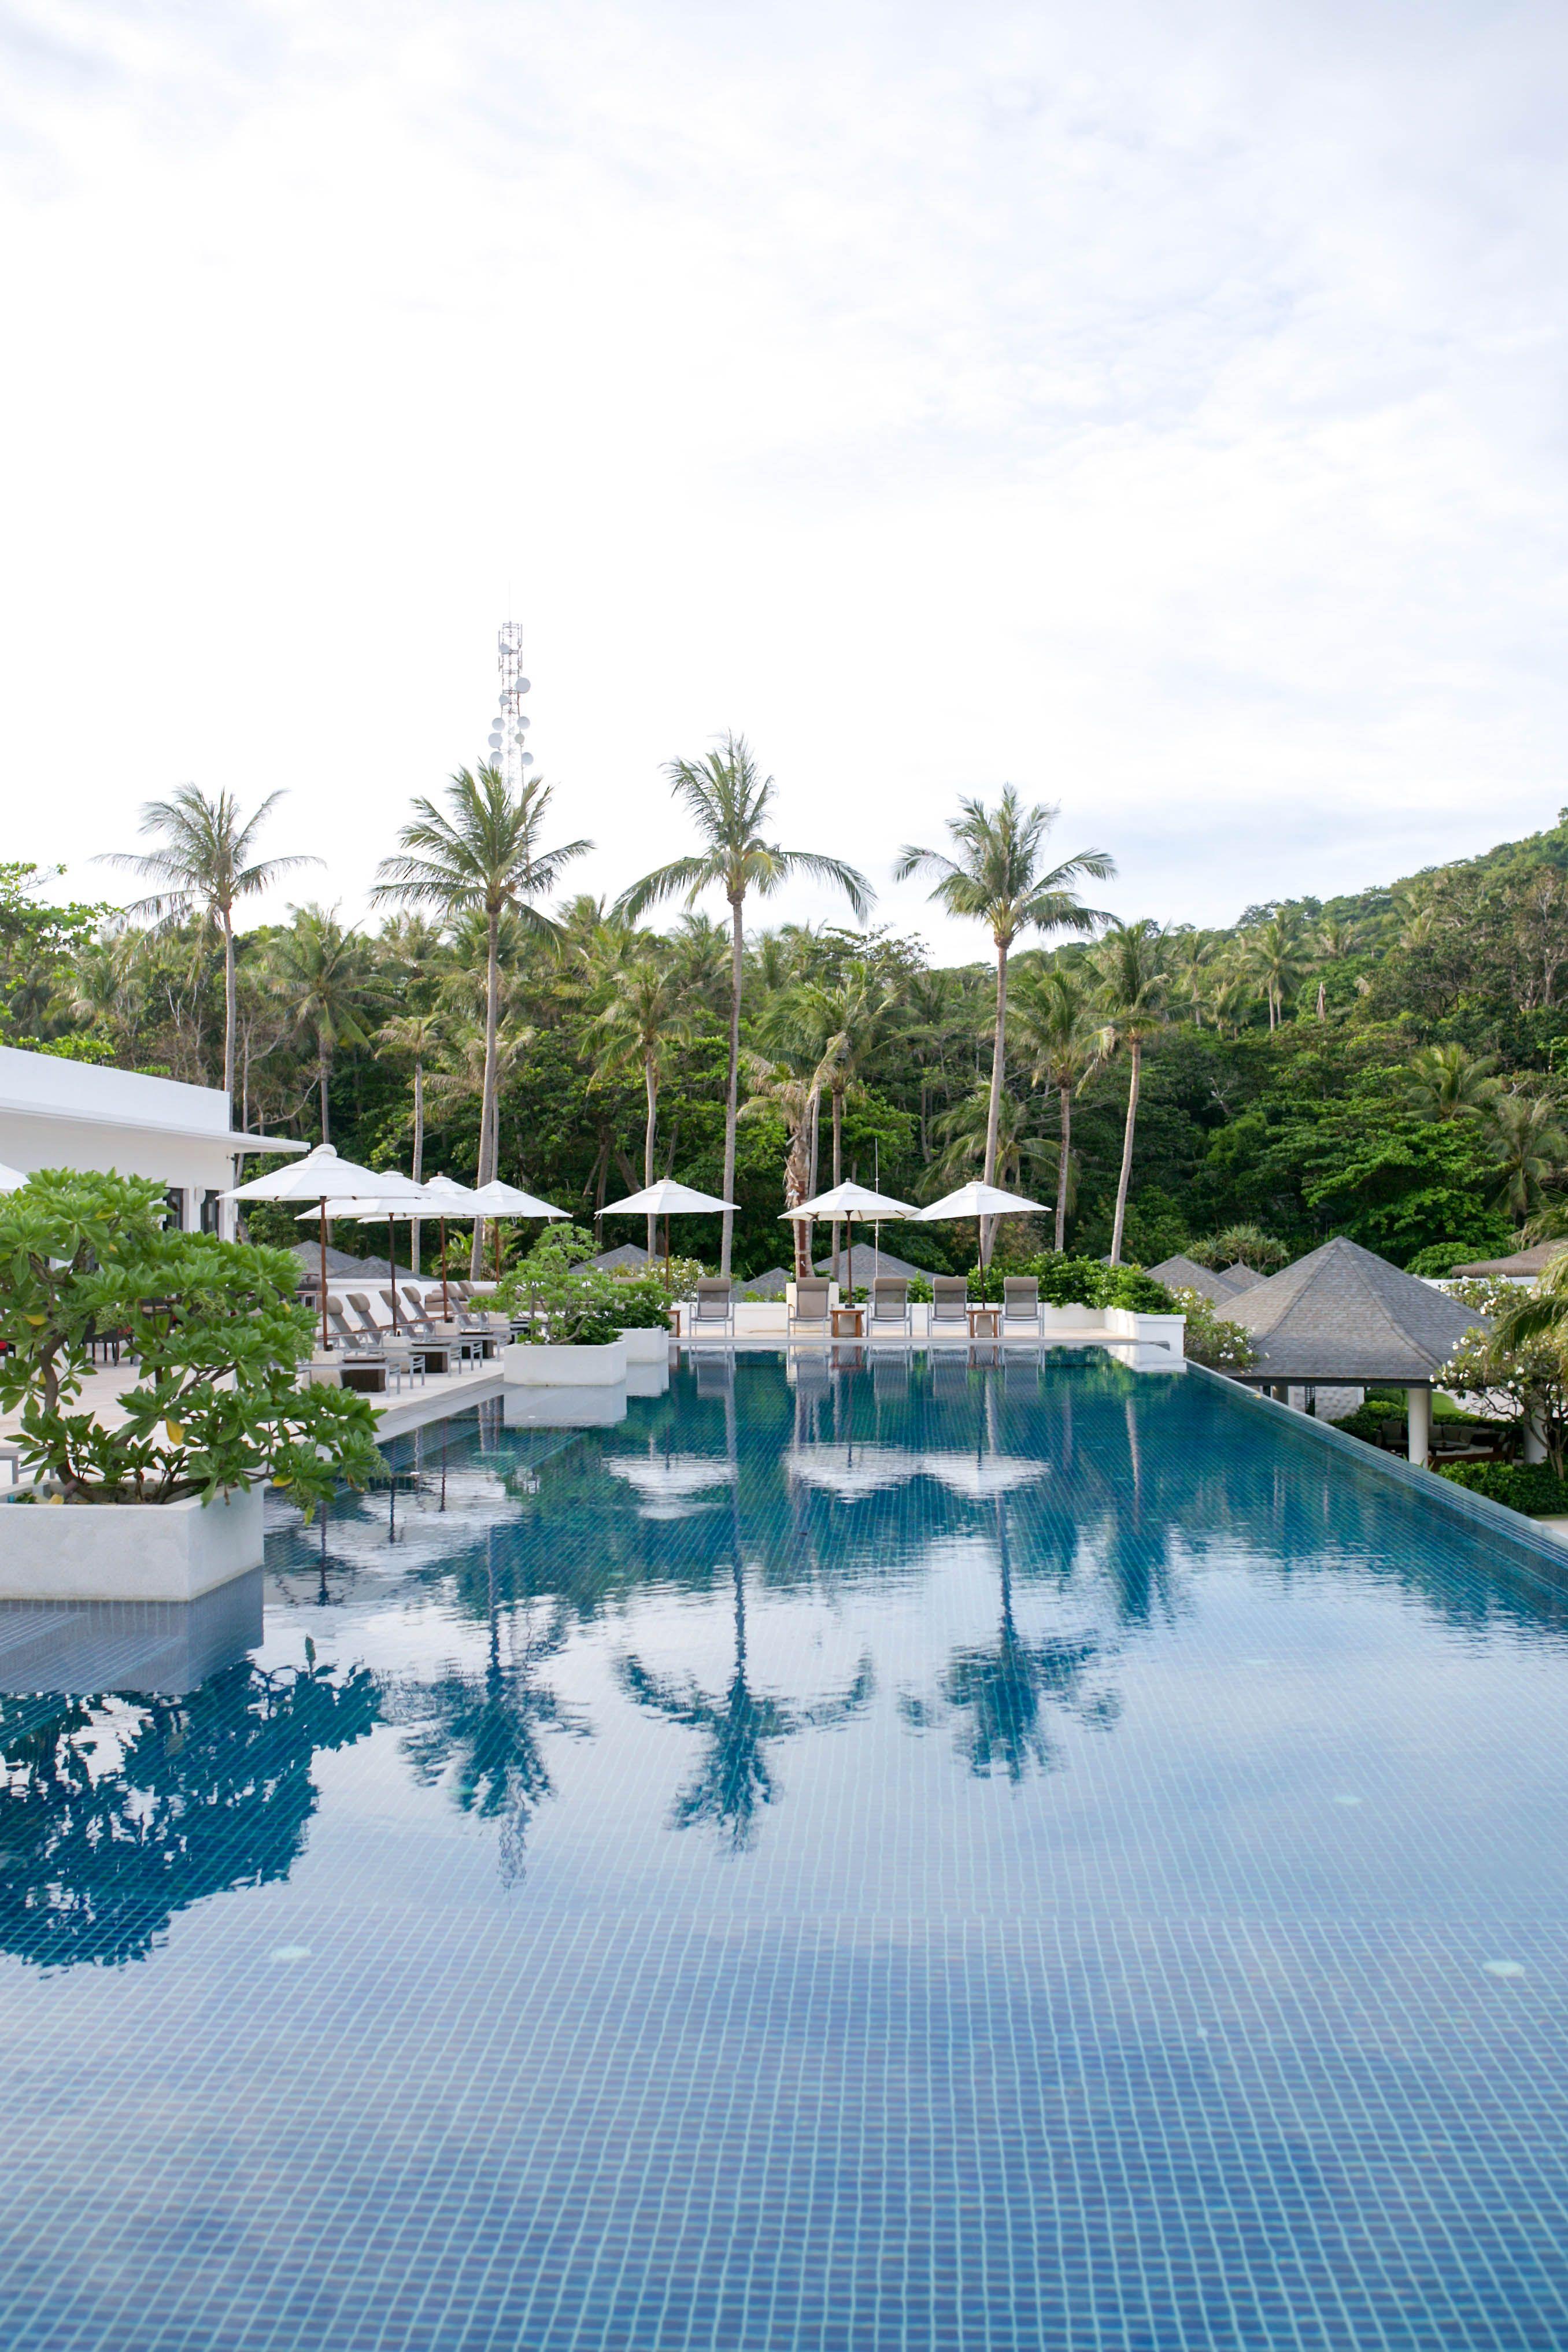 Island Hopping Through Thailand: A Two Week Itinerary